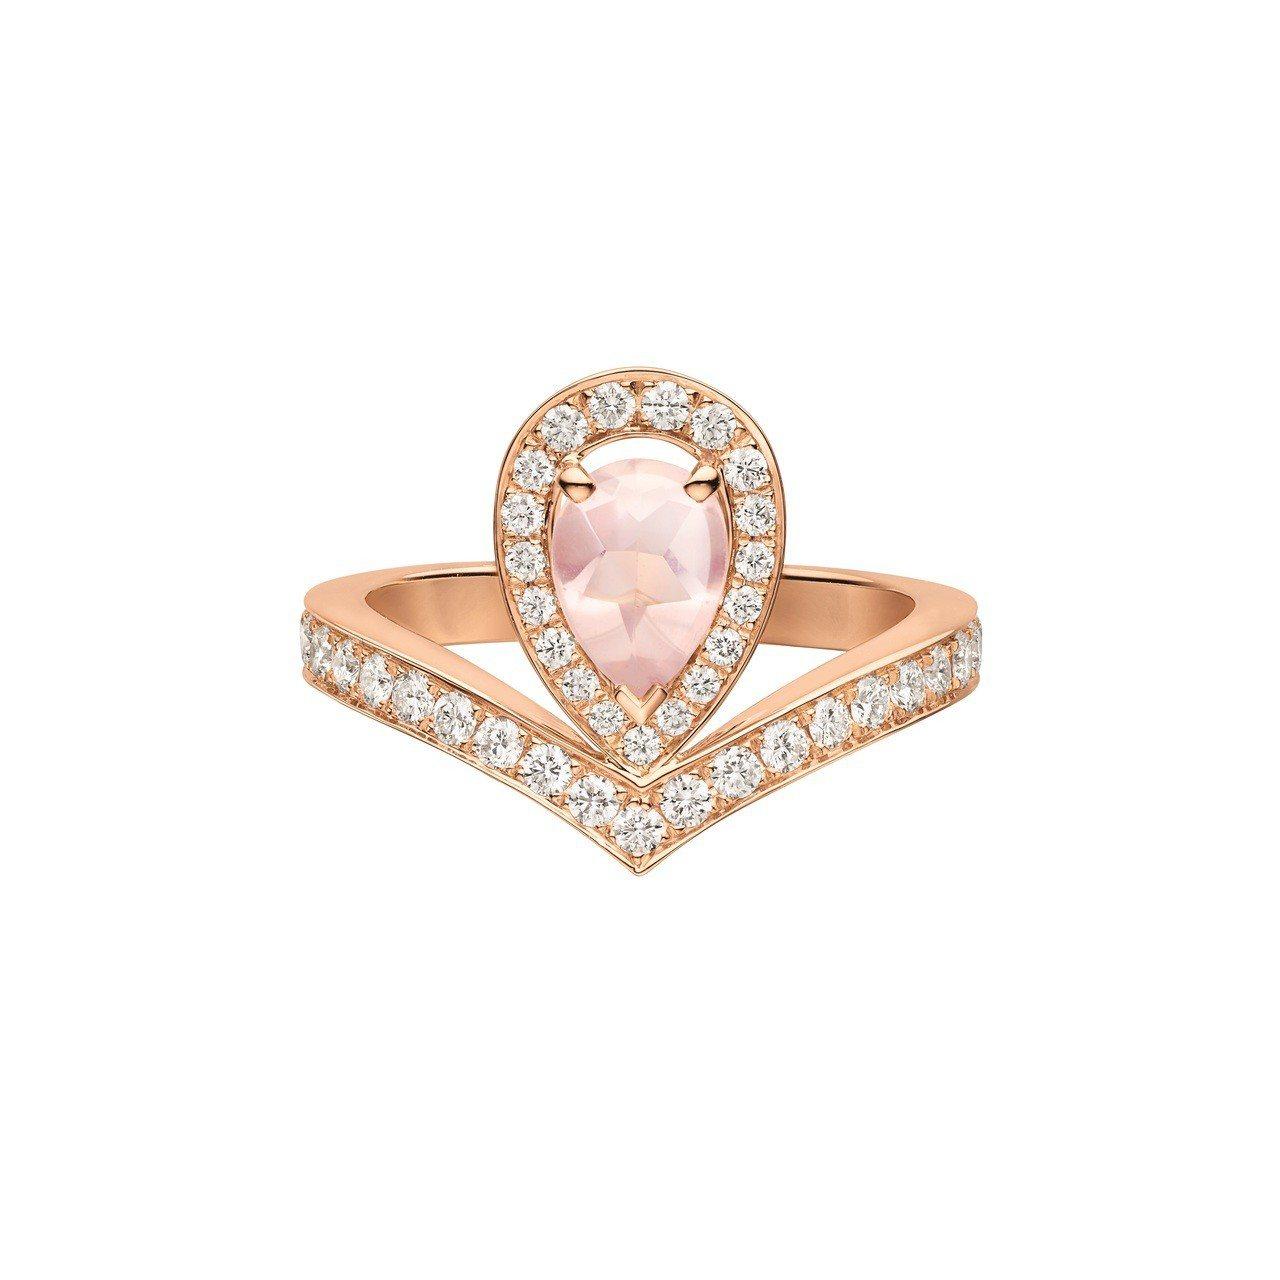 Chaumet Joséphine Aigrette 18K玫瑰金粉紅石英戒指...